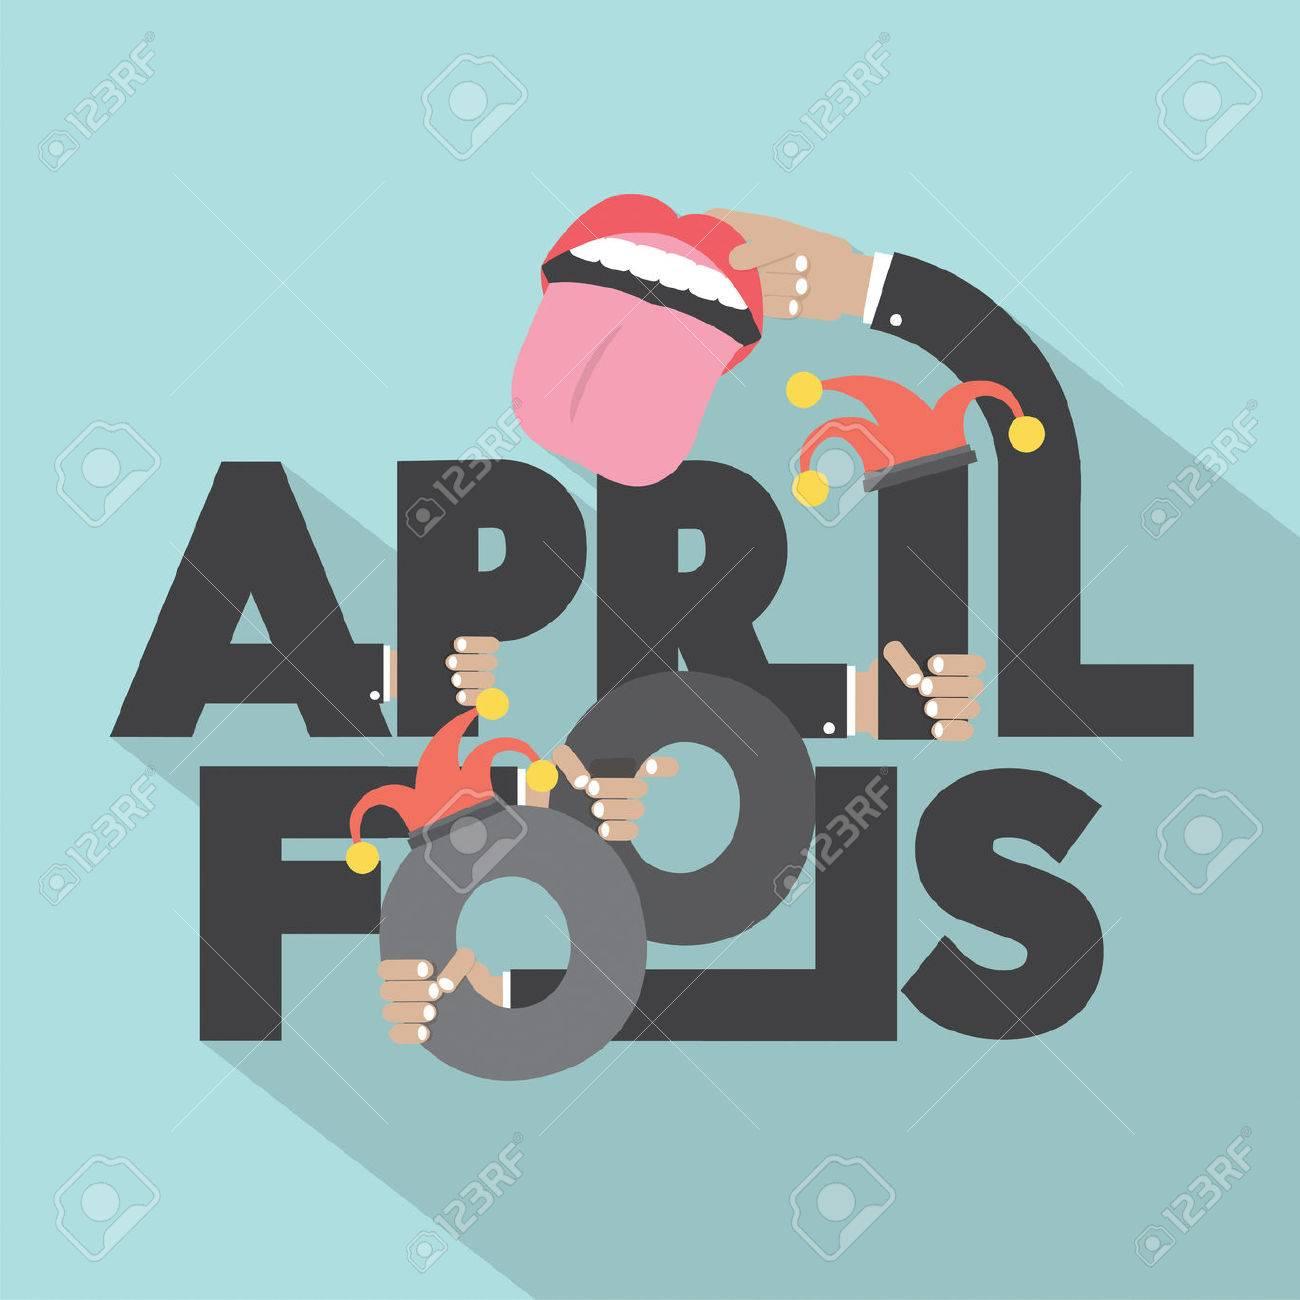 April Fools Typography Design Vector Illustration - 37686634